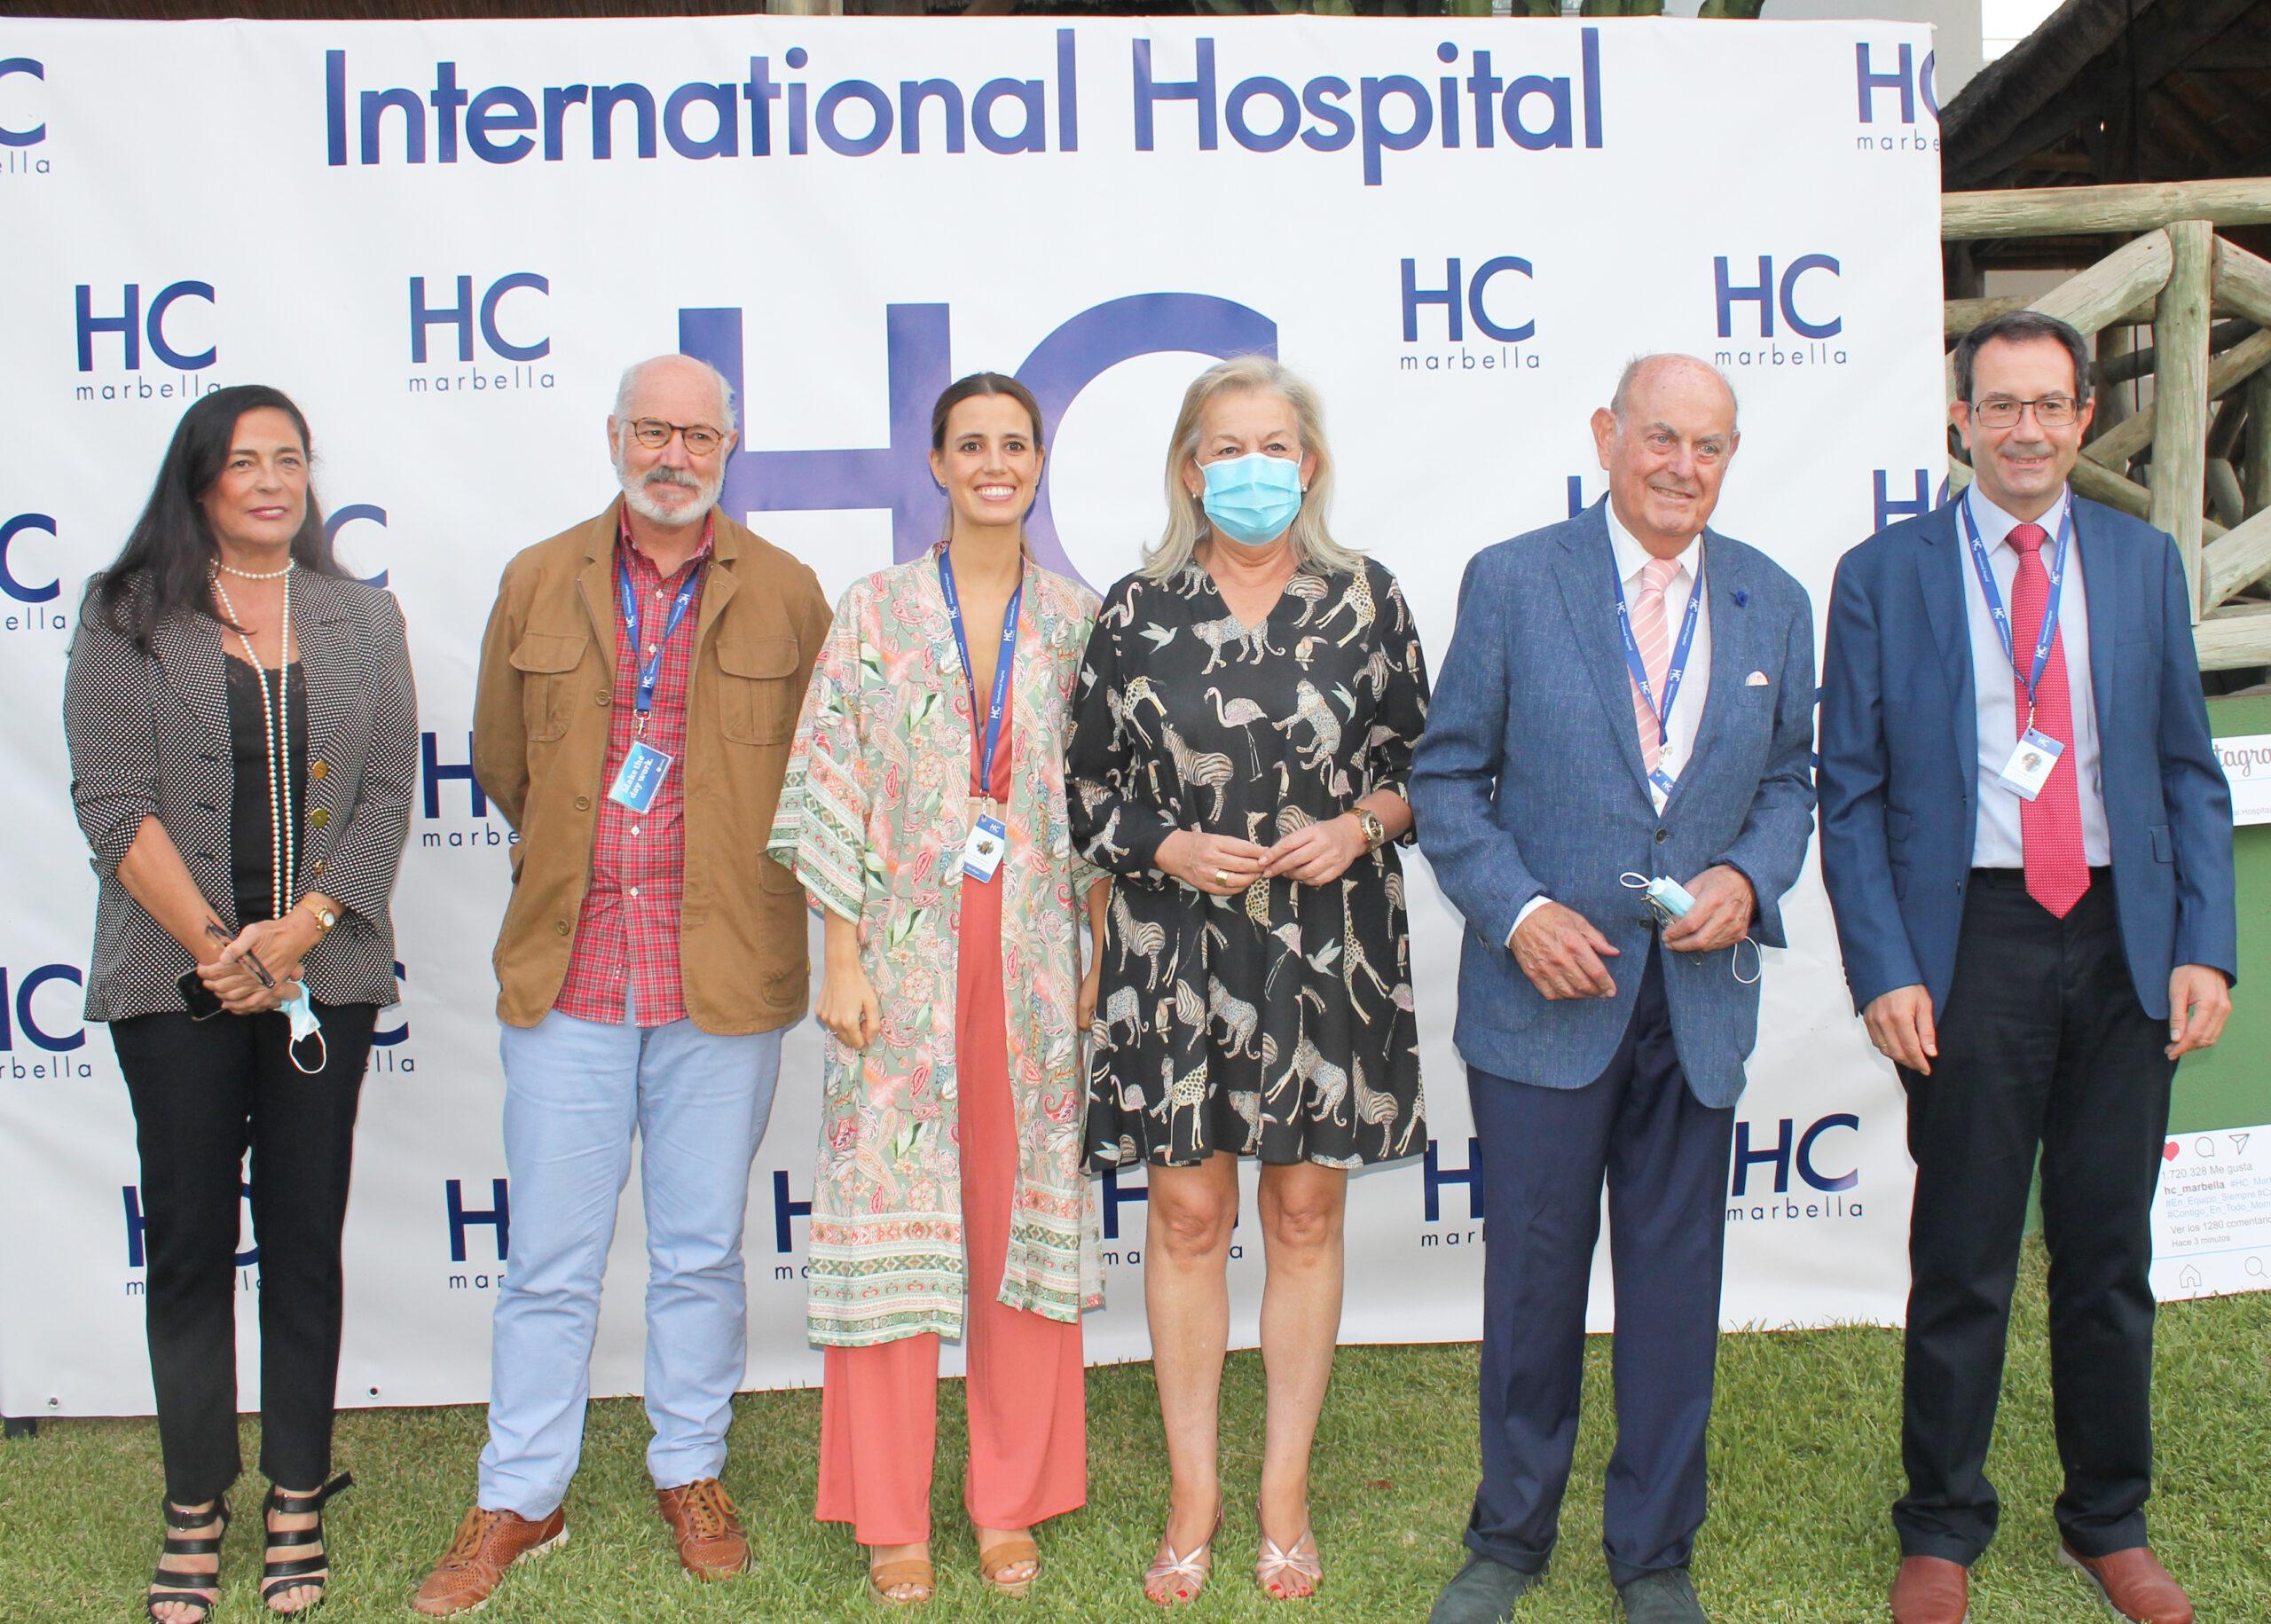 Inauguración HCCC